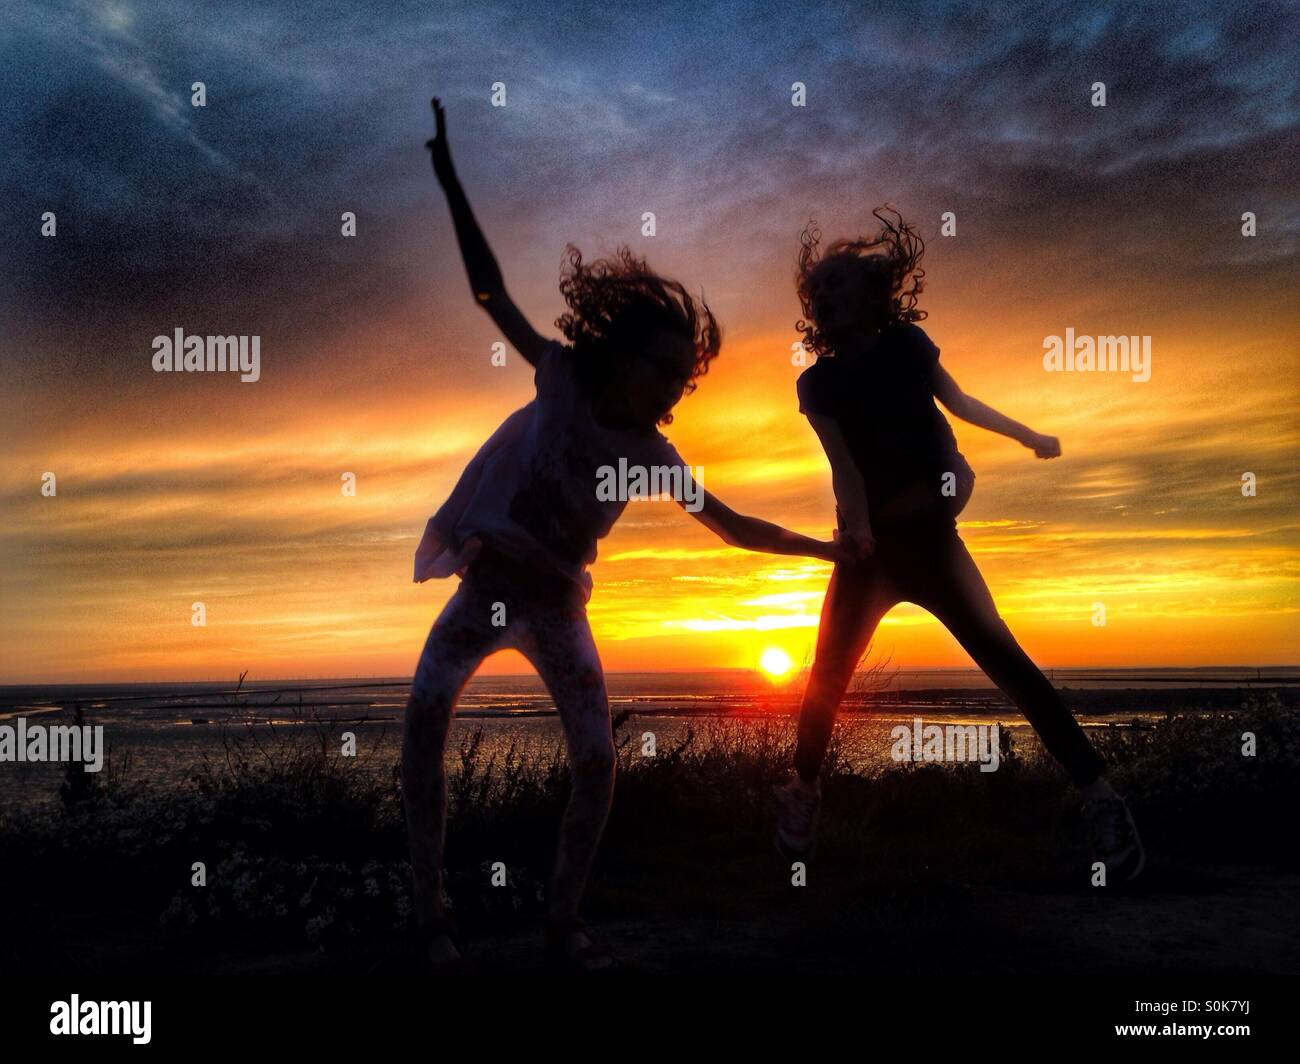 Children having fun in silhouette against the setting sun Stock Photo